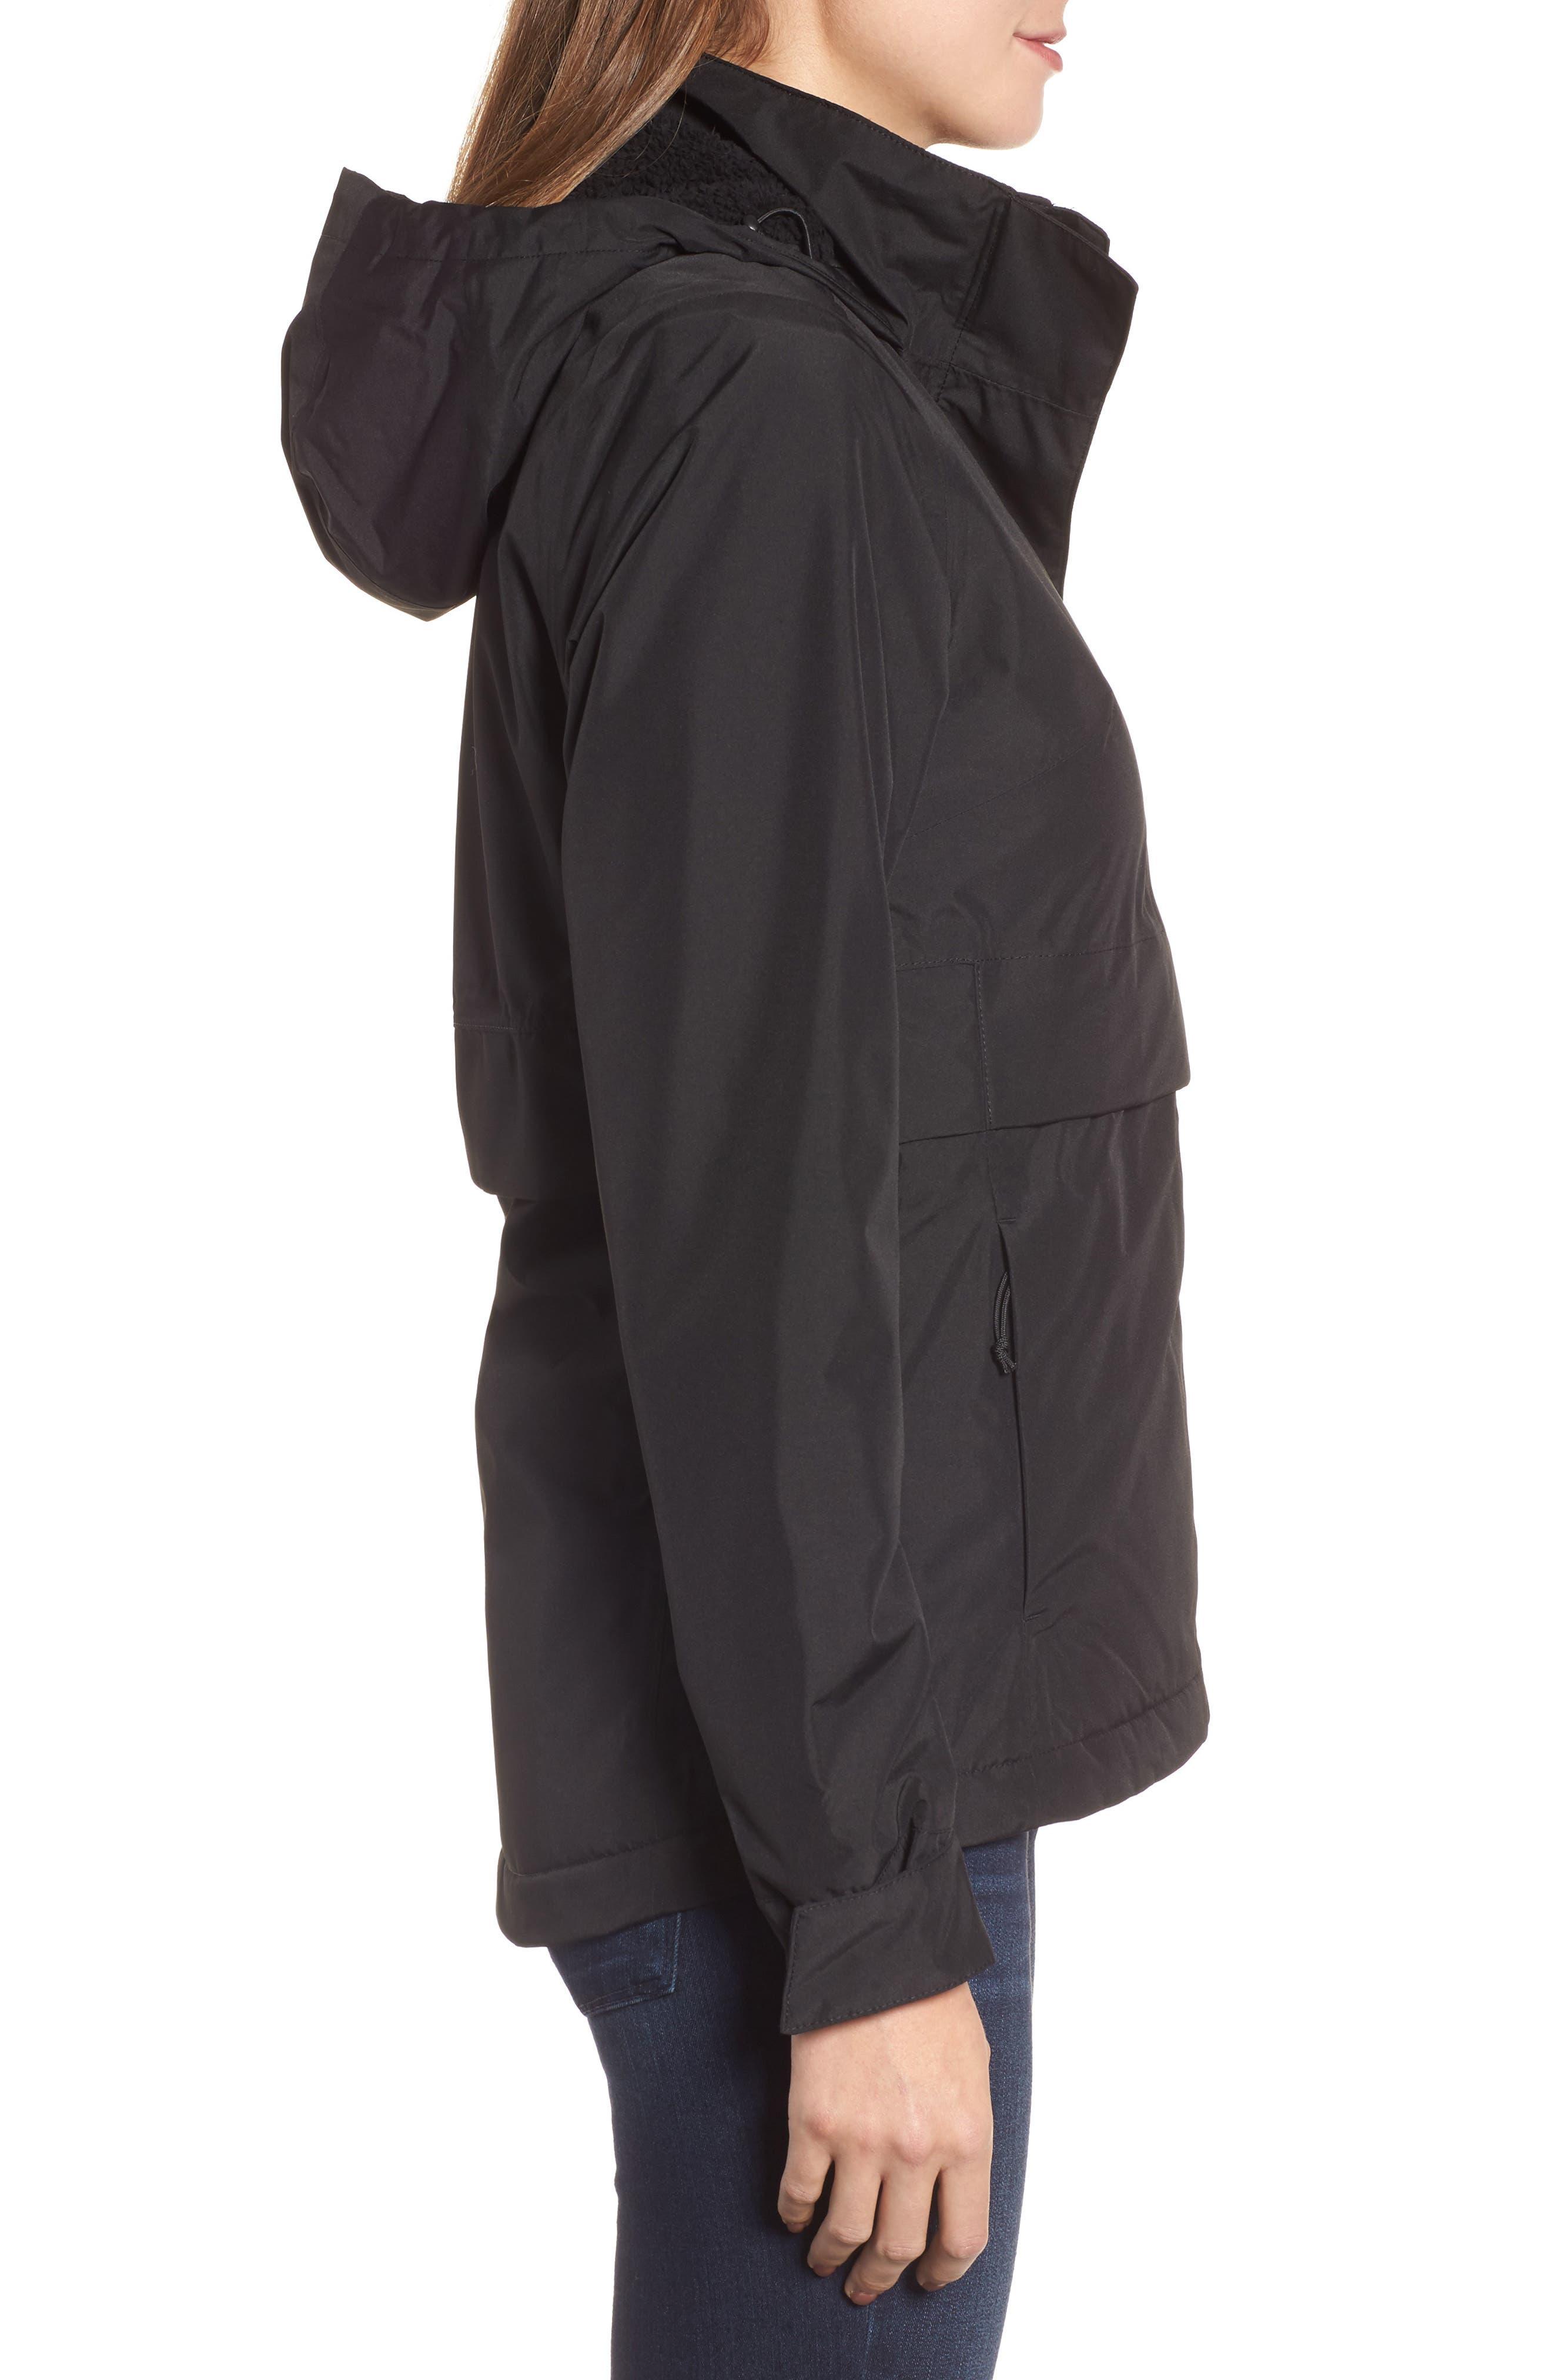 Morialta Jacket,                             Alternate thumbnail 3, color,                             001